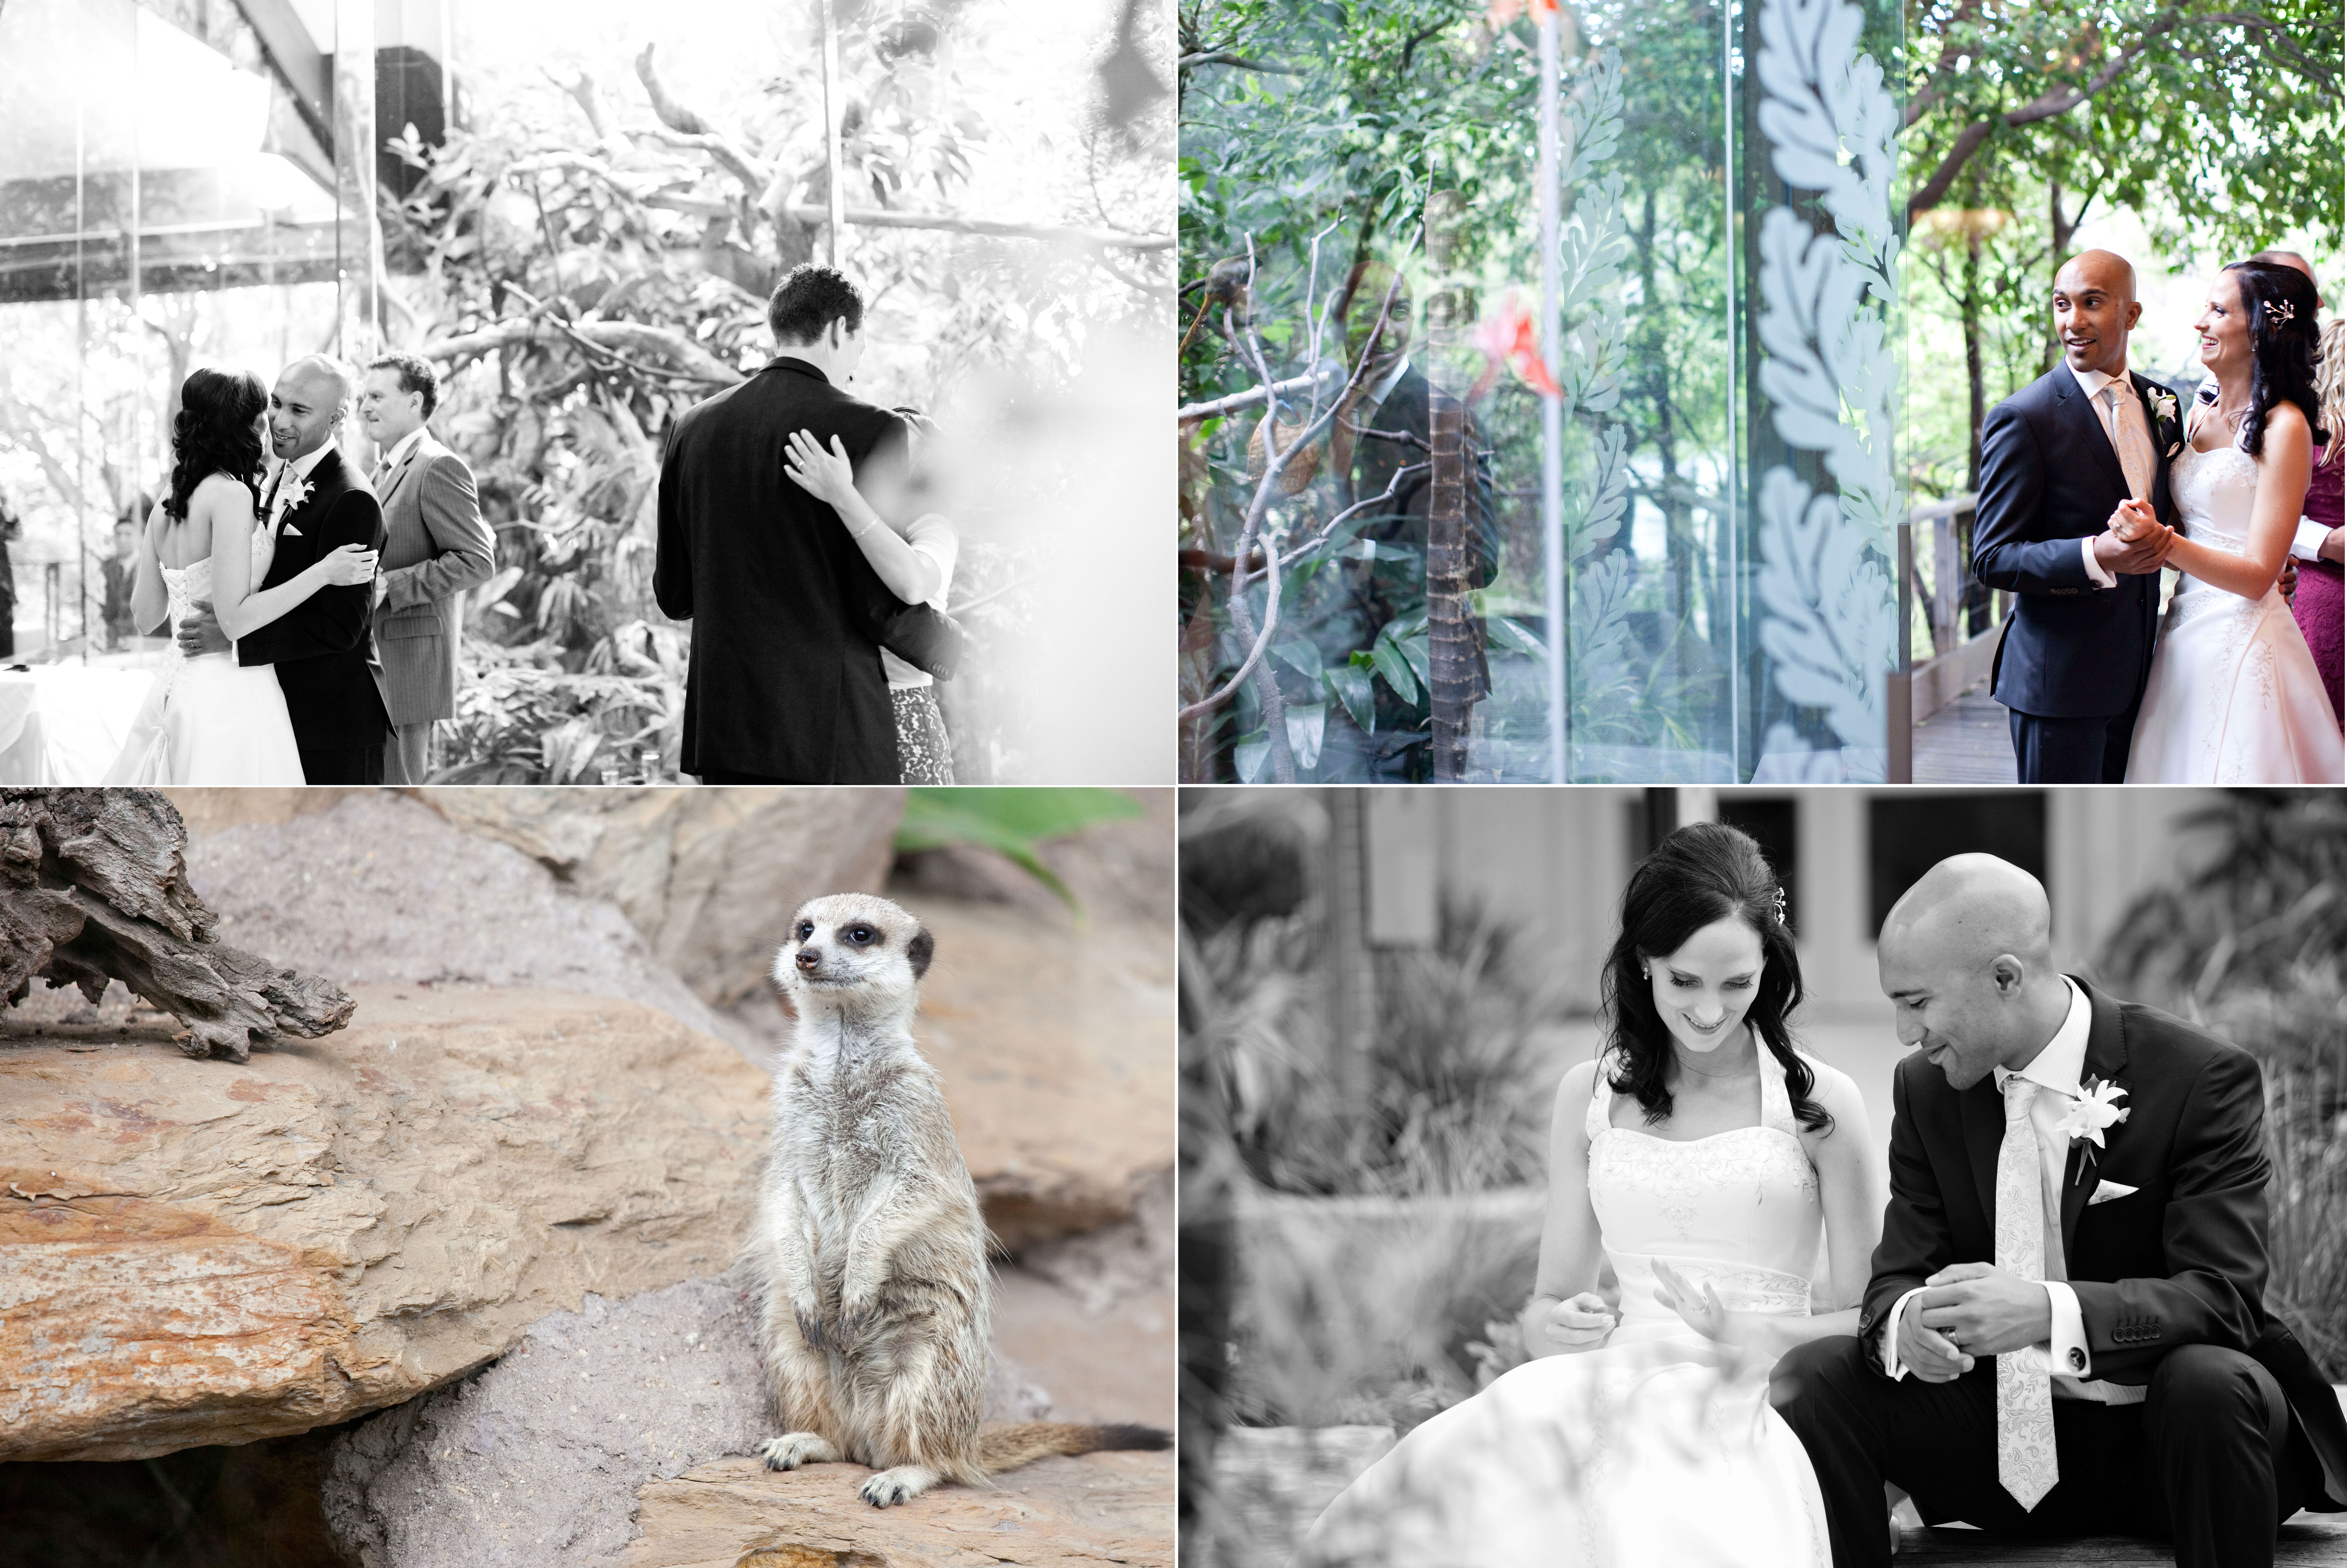 Bride and groom melbourne zoo wedding animal encounter